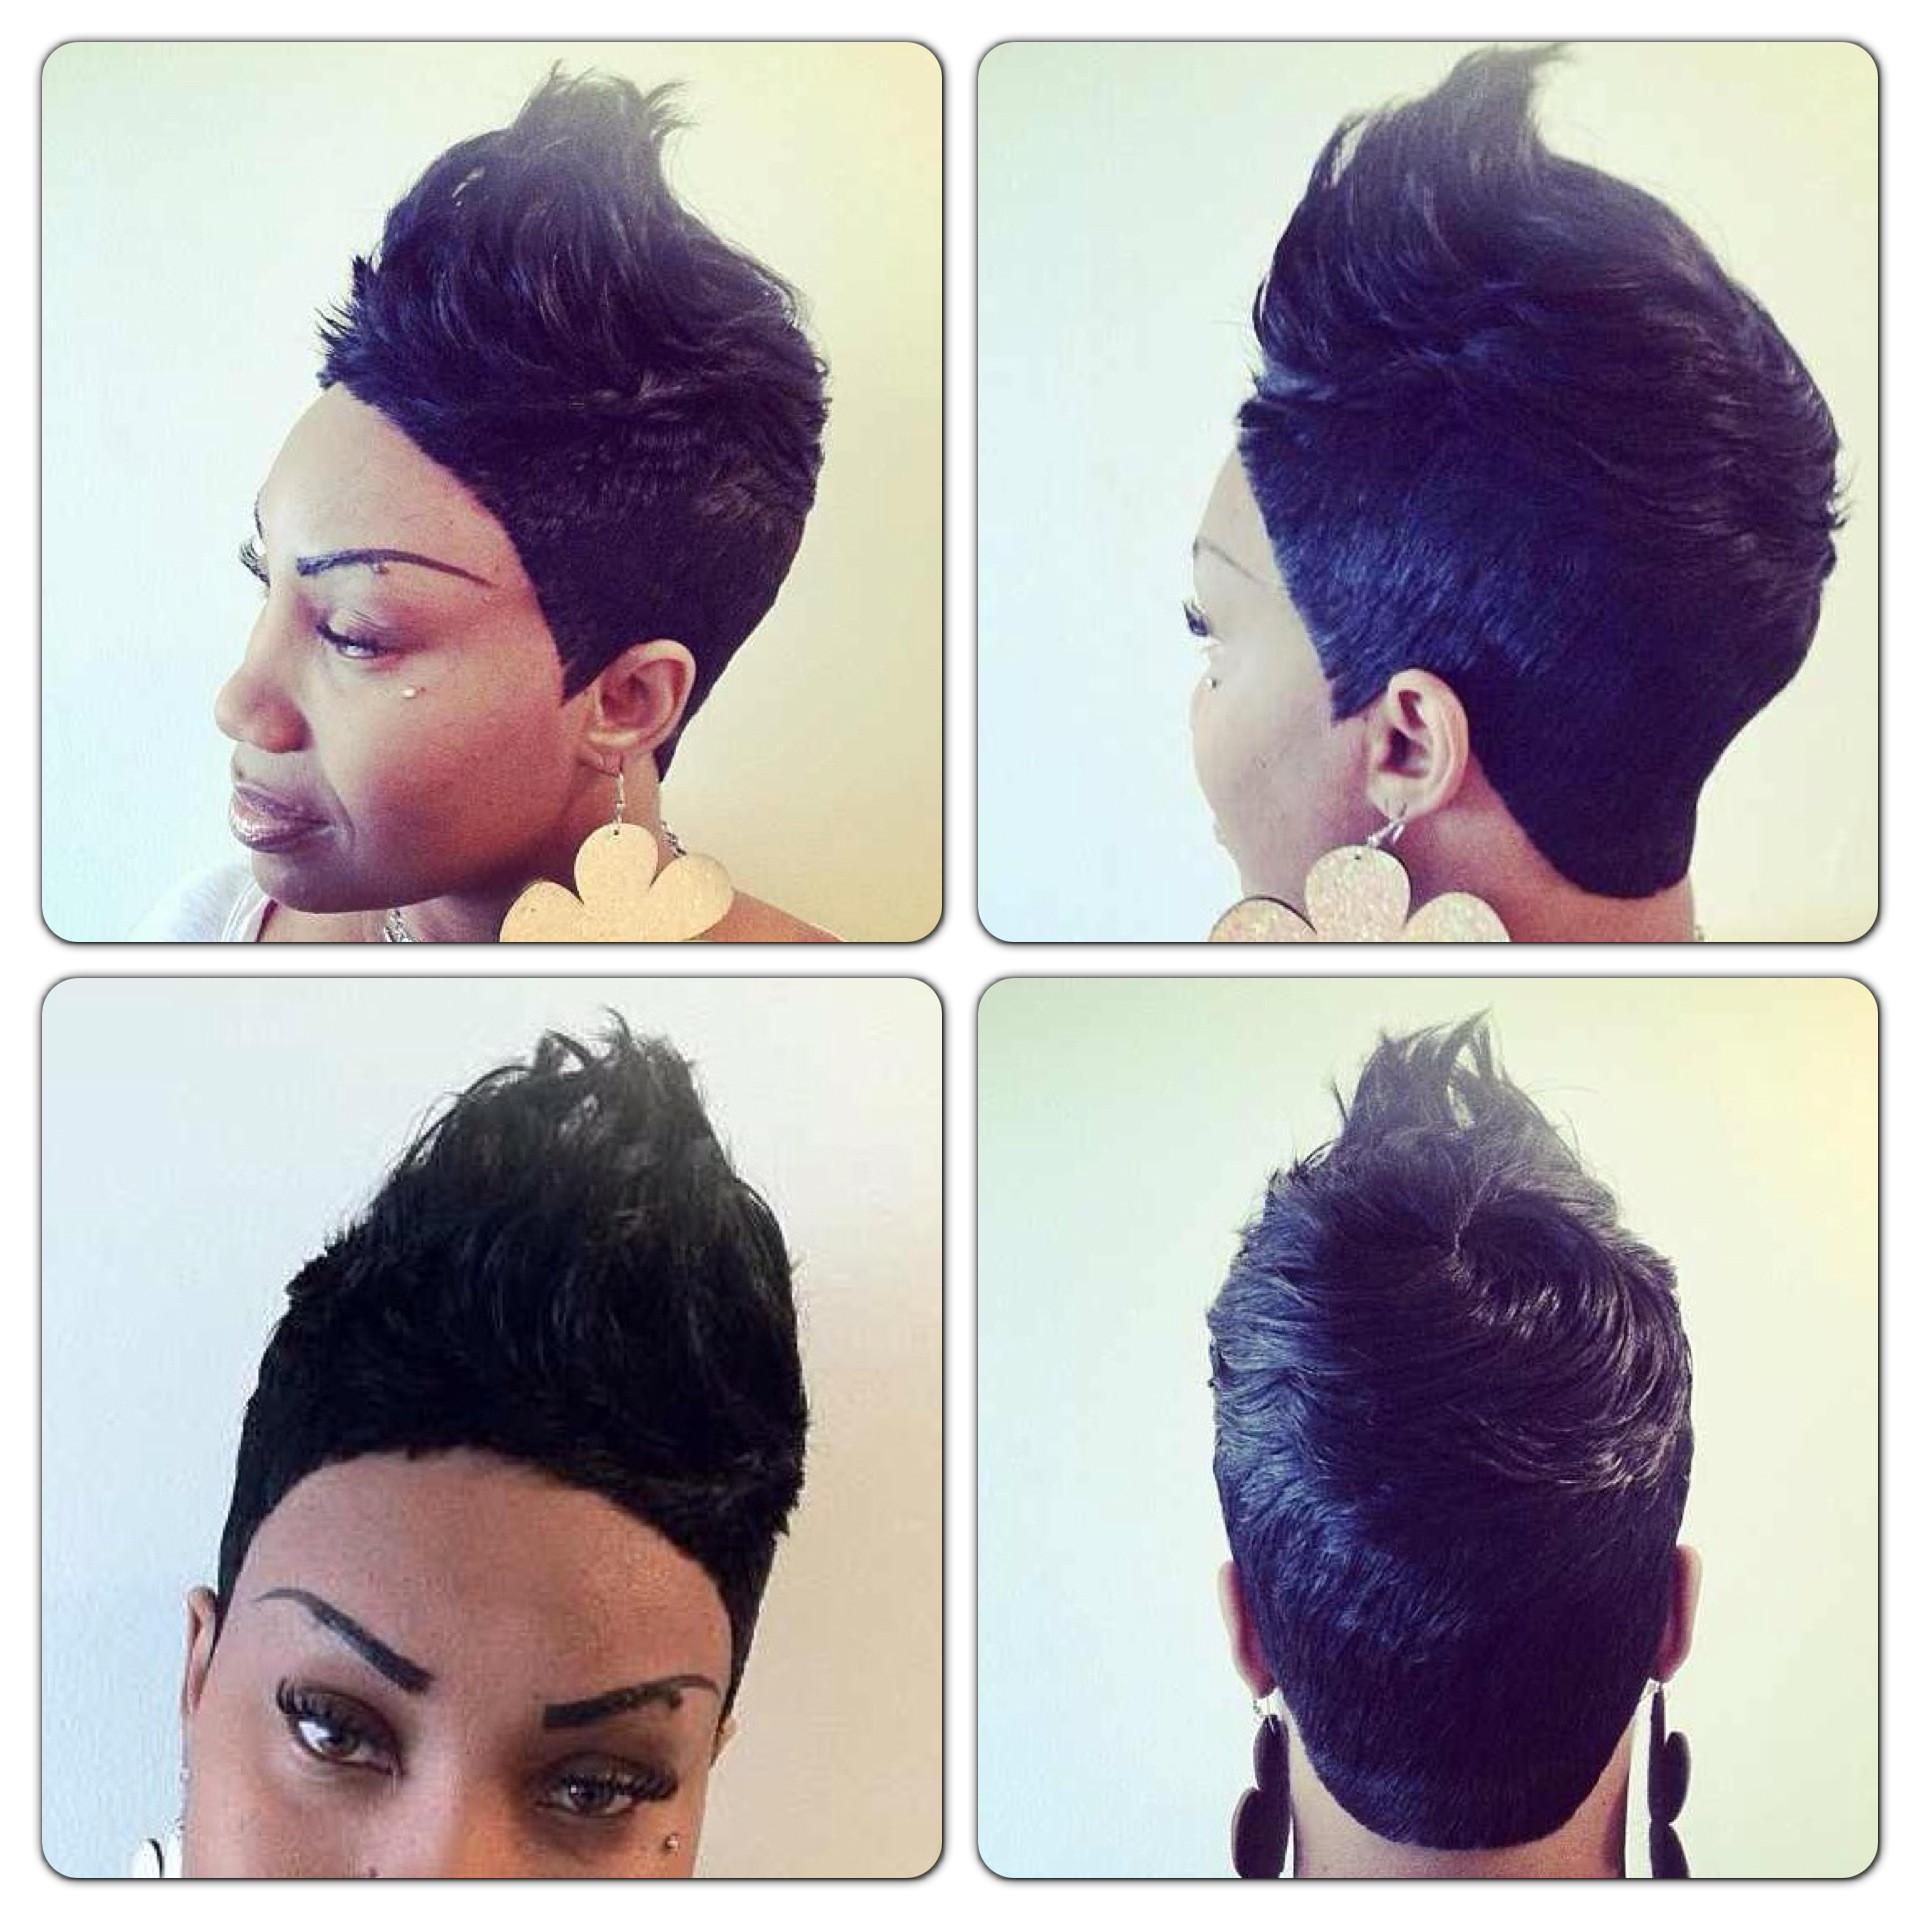 28 Piece Weave Short Hairstyles  28 Piece Quick Weave Short Hairstyles HairStyles